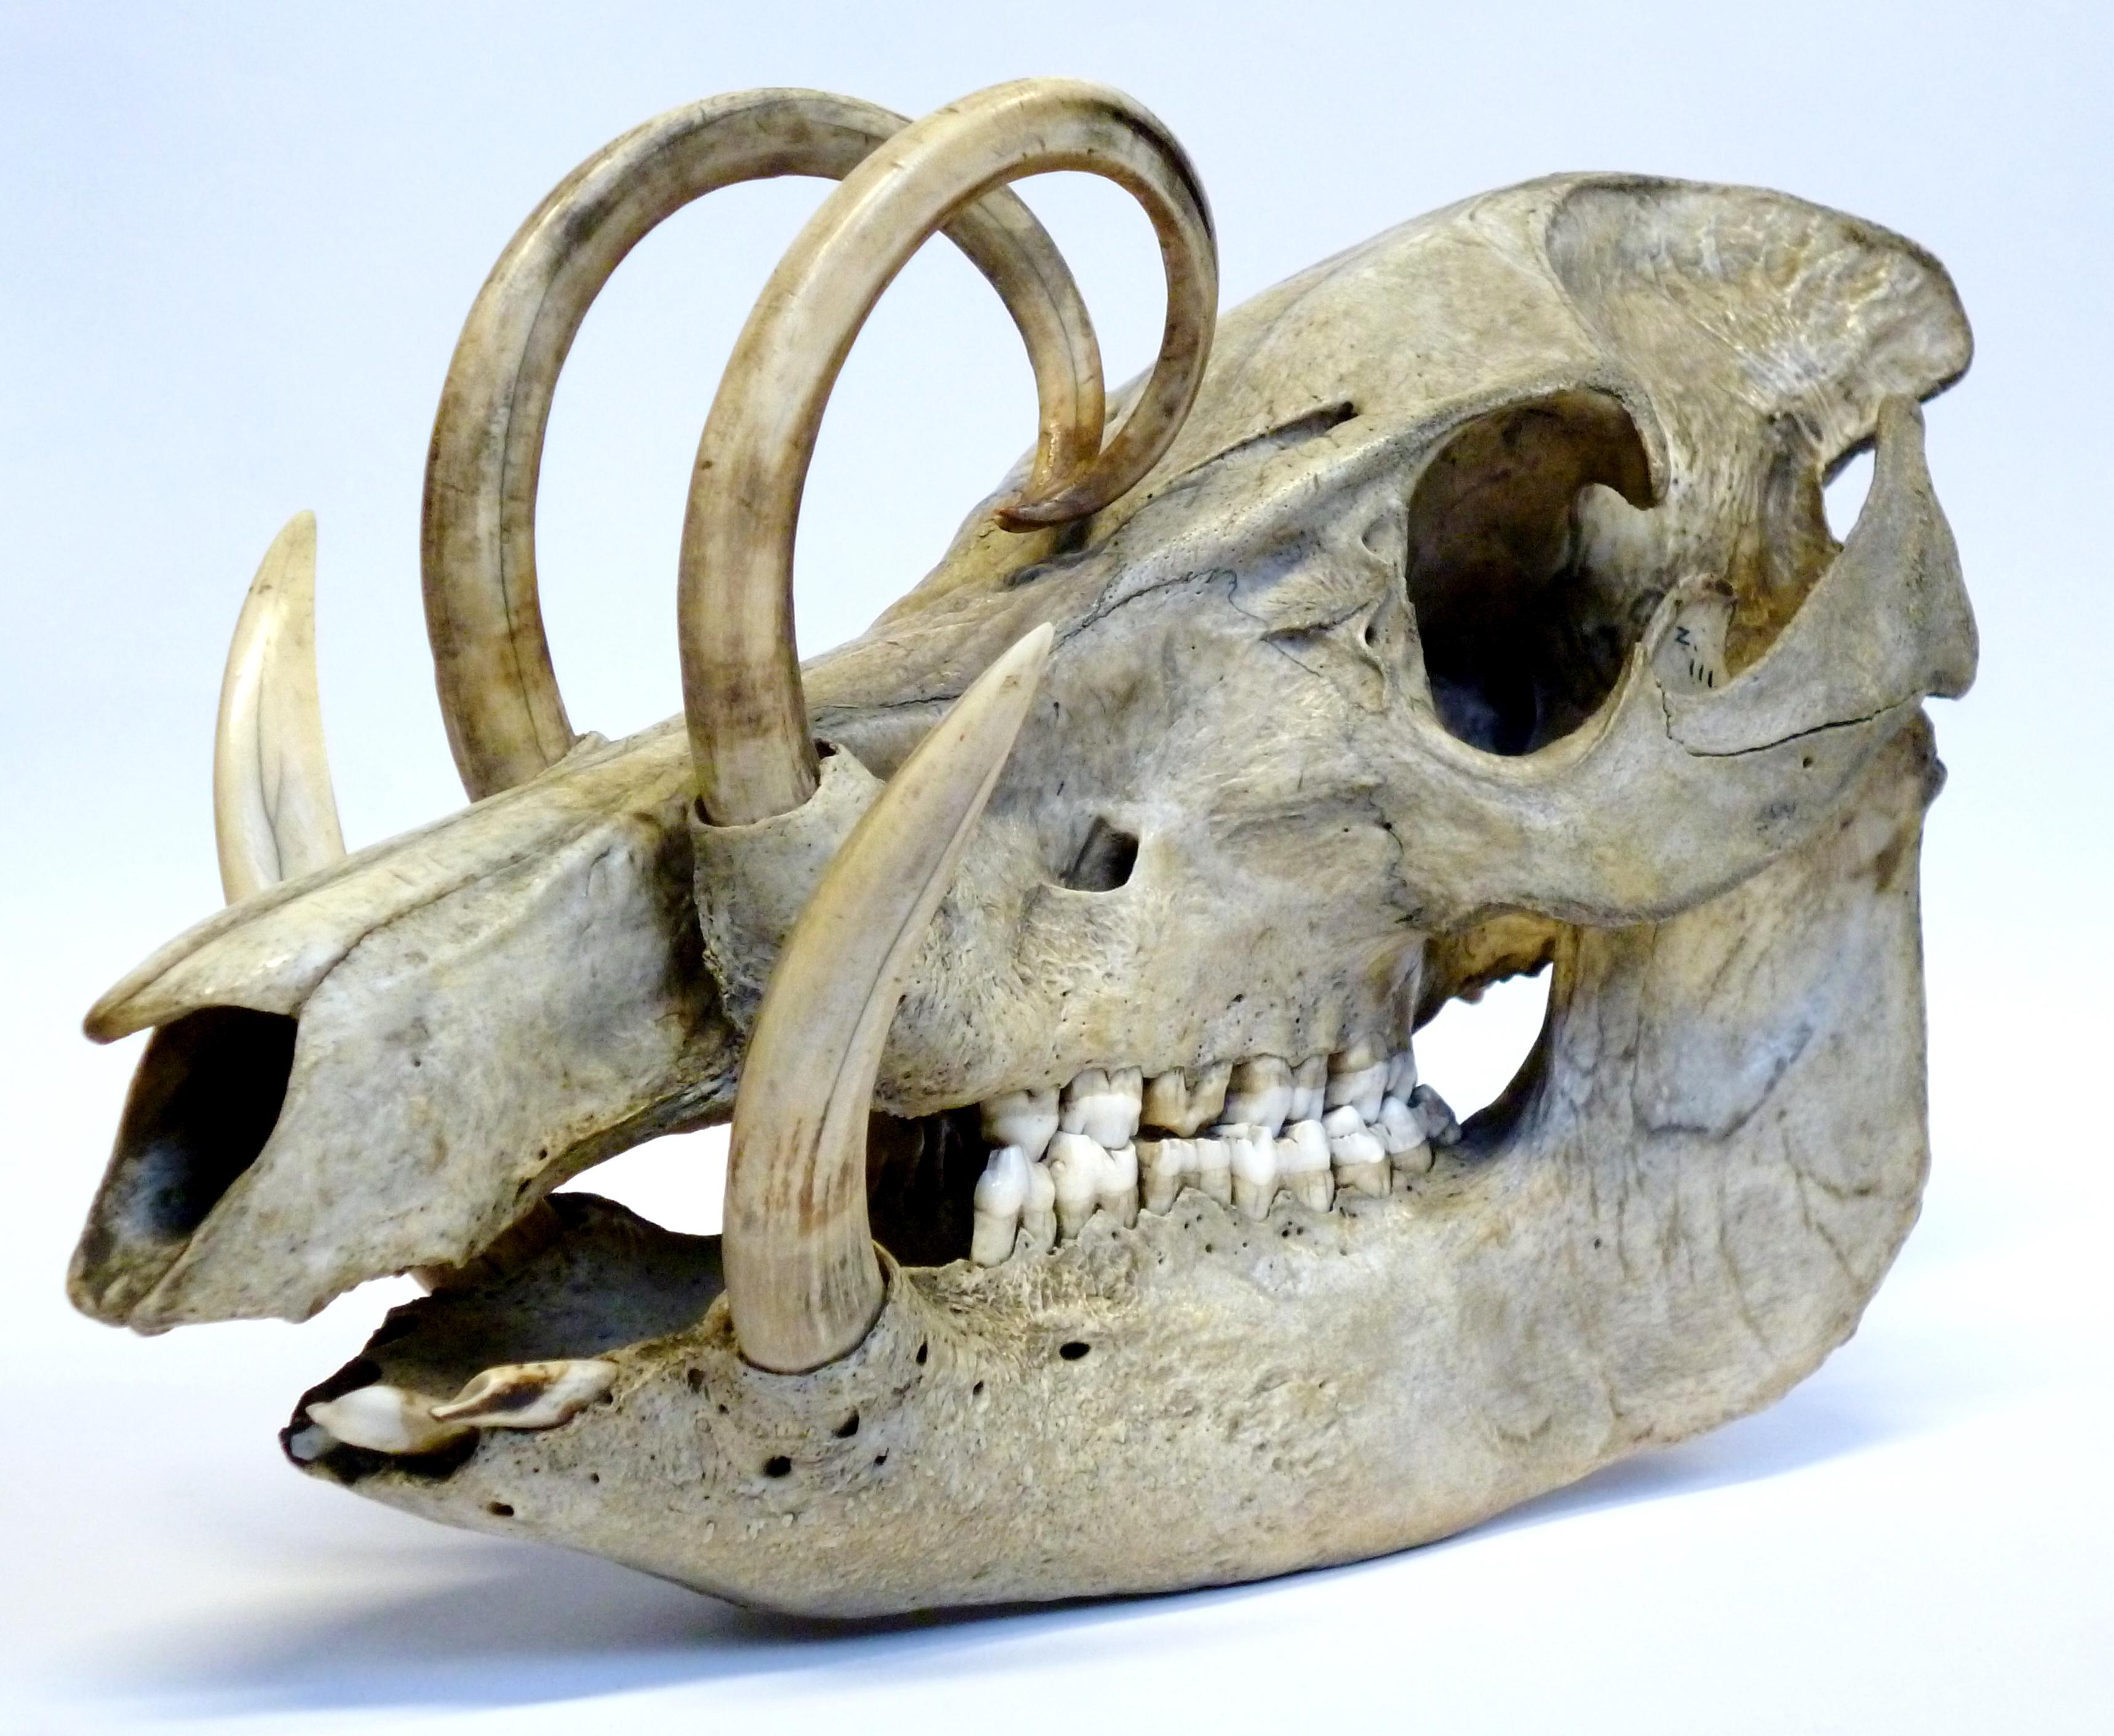 LDUCZ-Z111 Babyrousa babyrussa skull